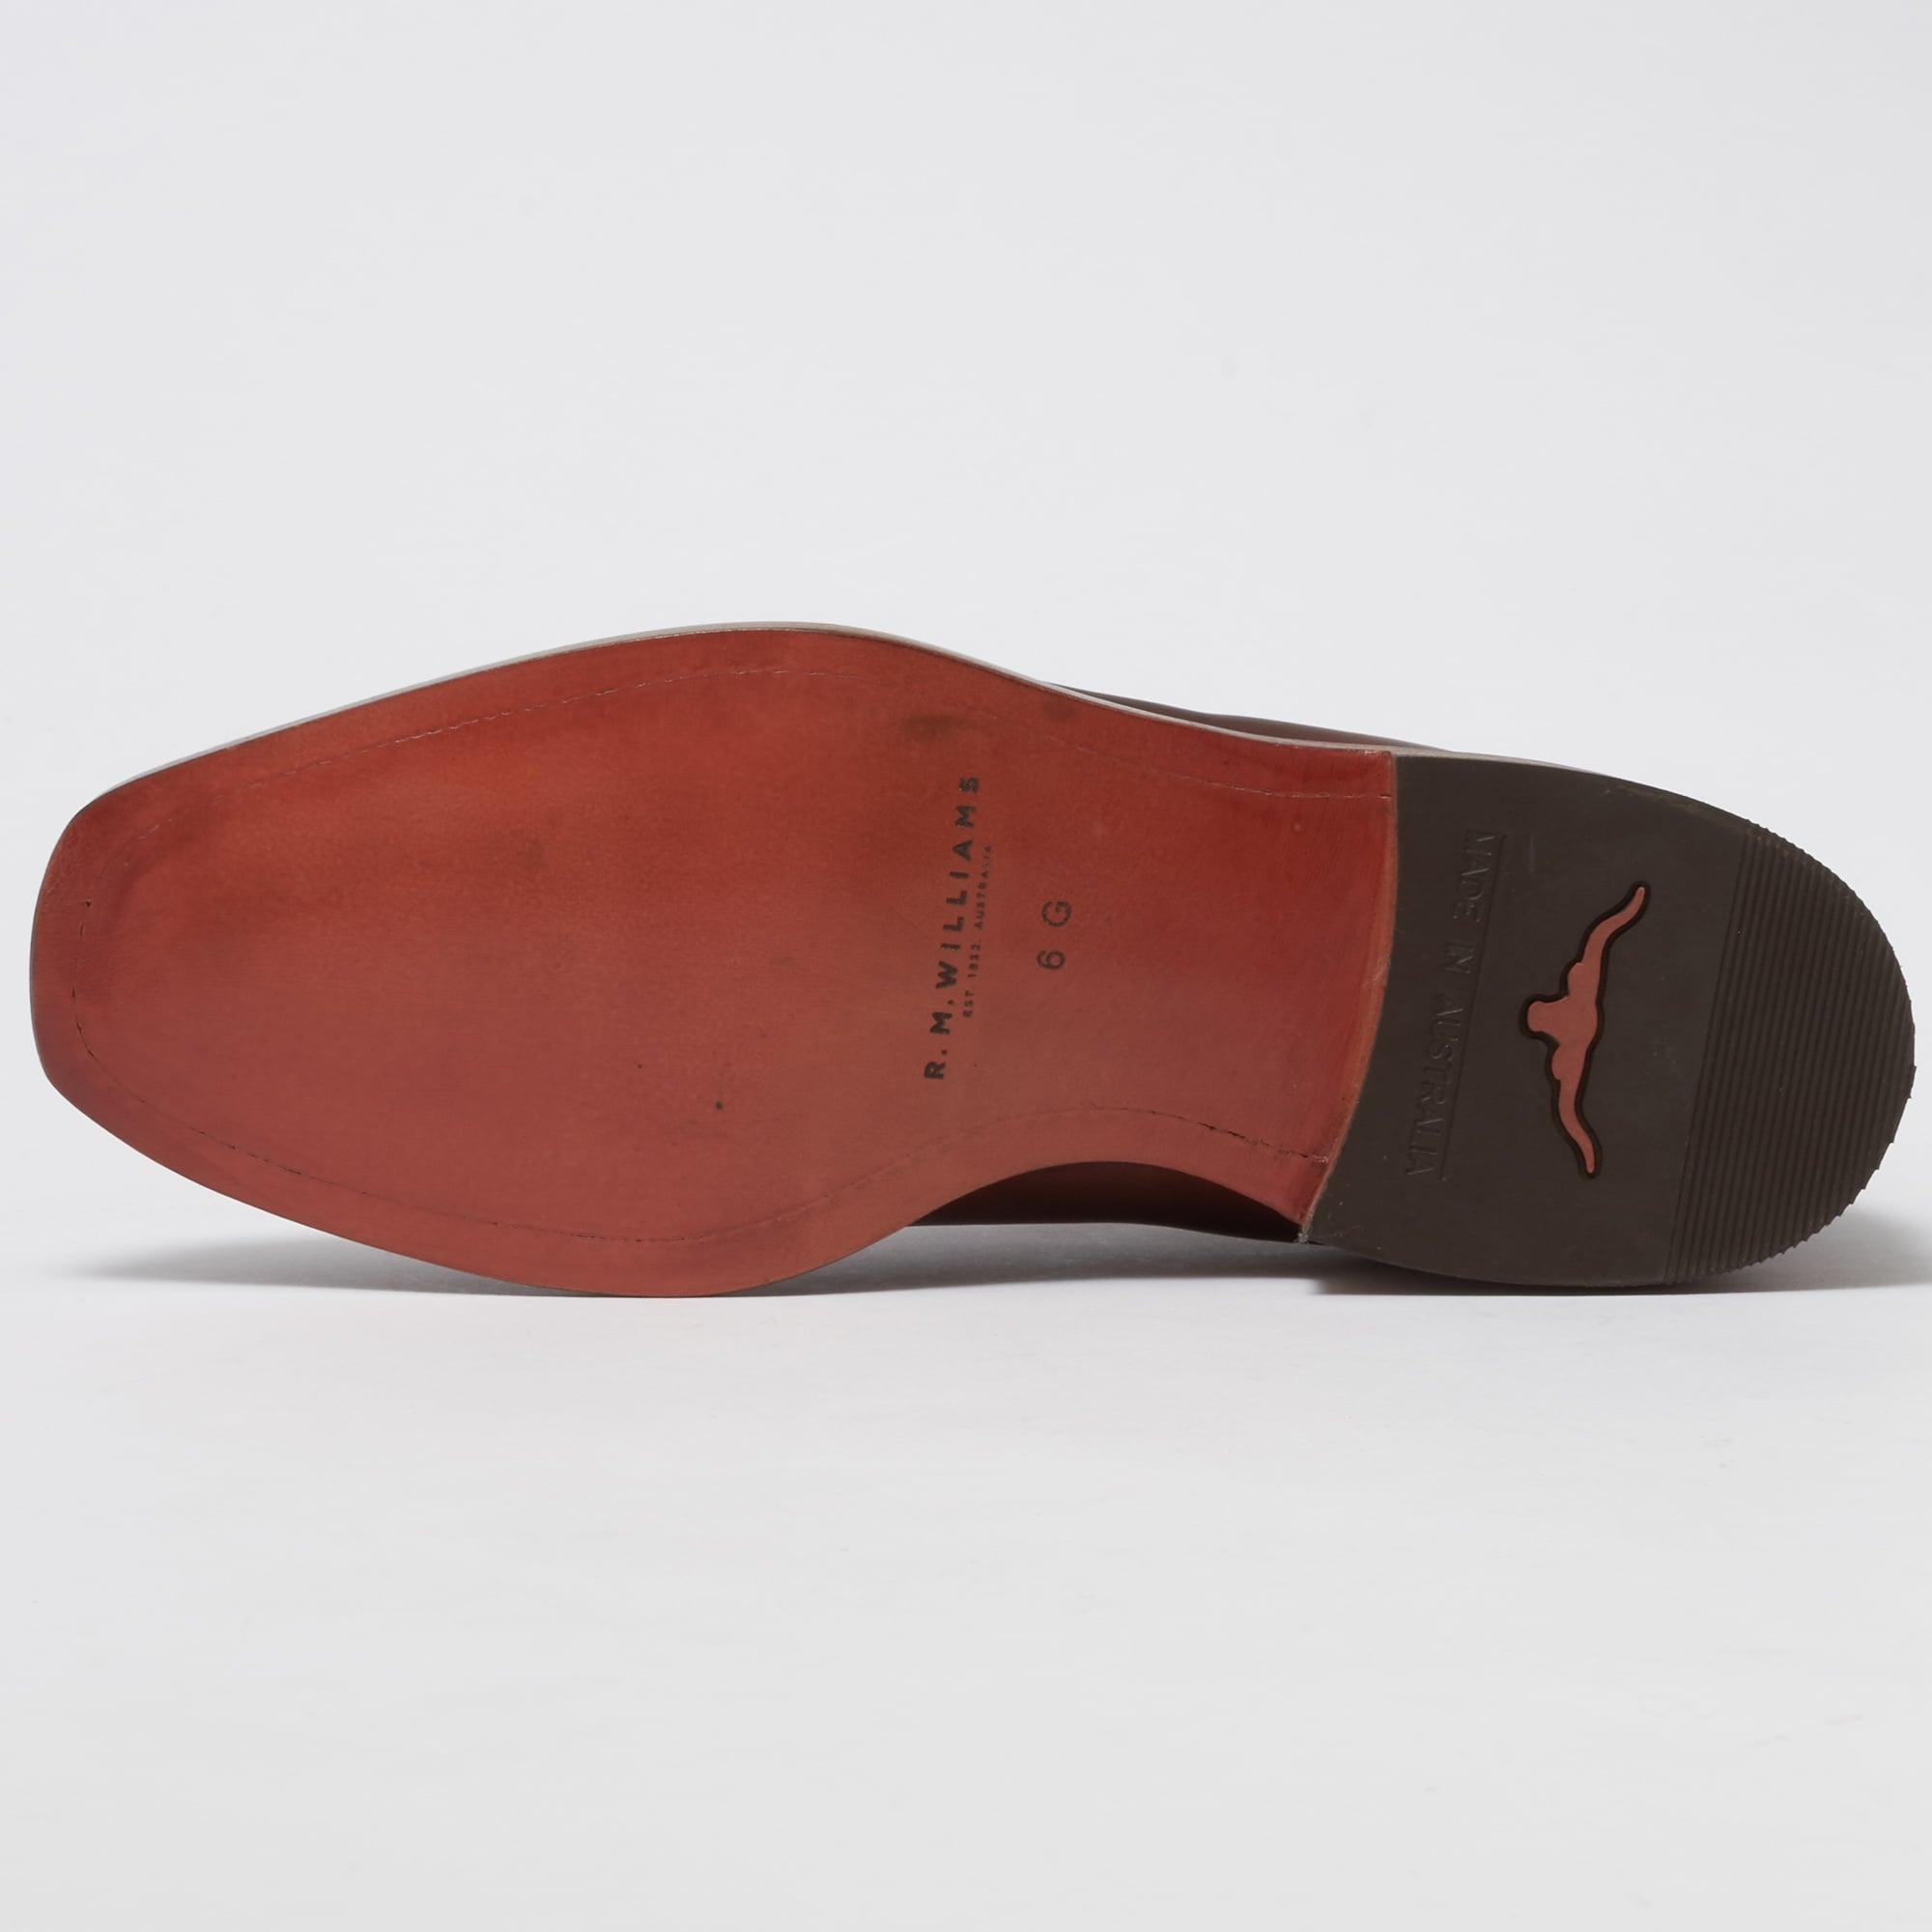 03423aaef16 RM WILLIAMS Boots - Men's Chinchilla - Cognac